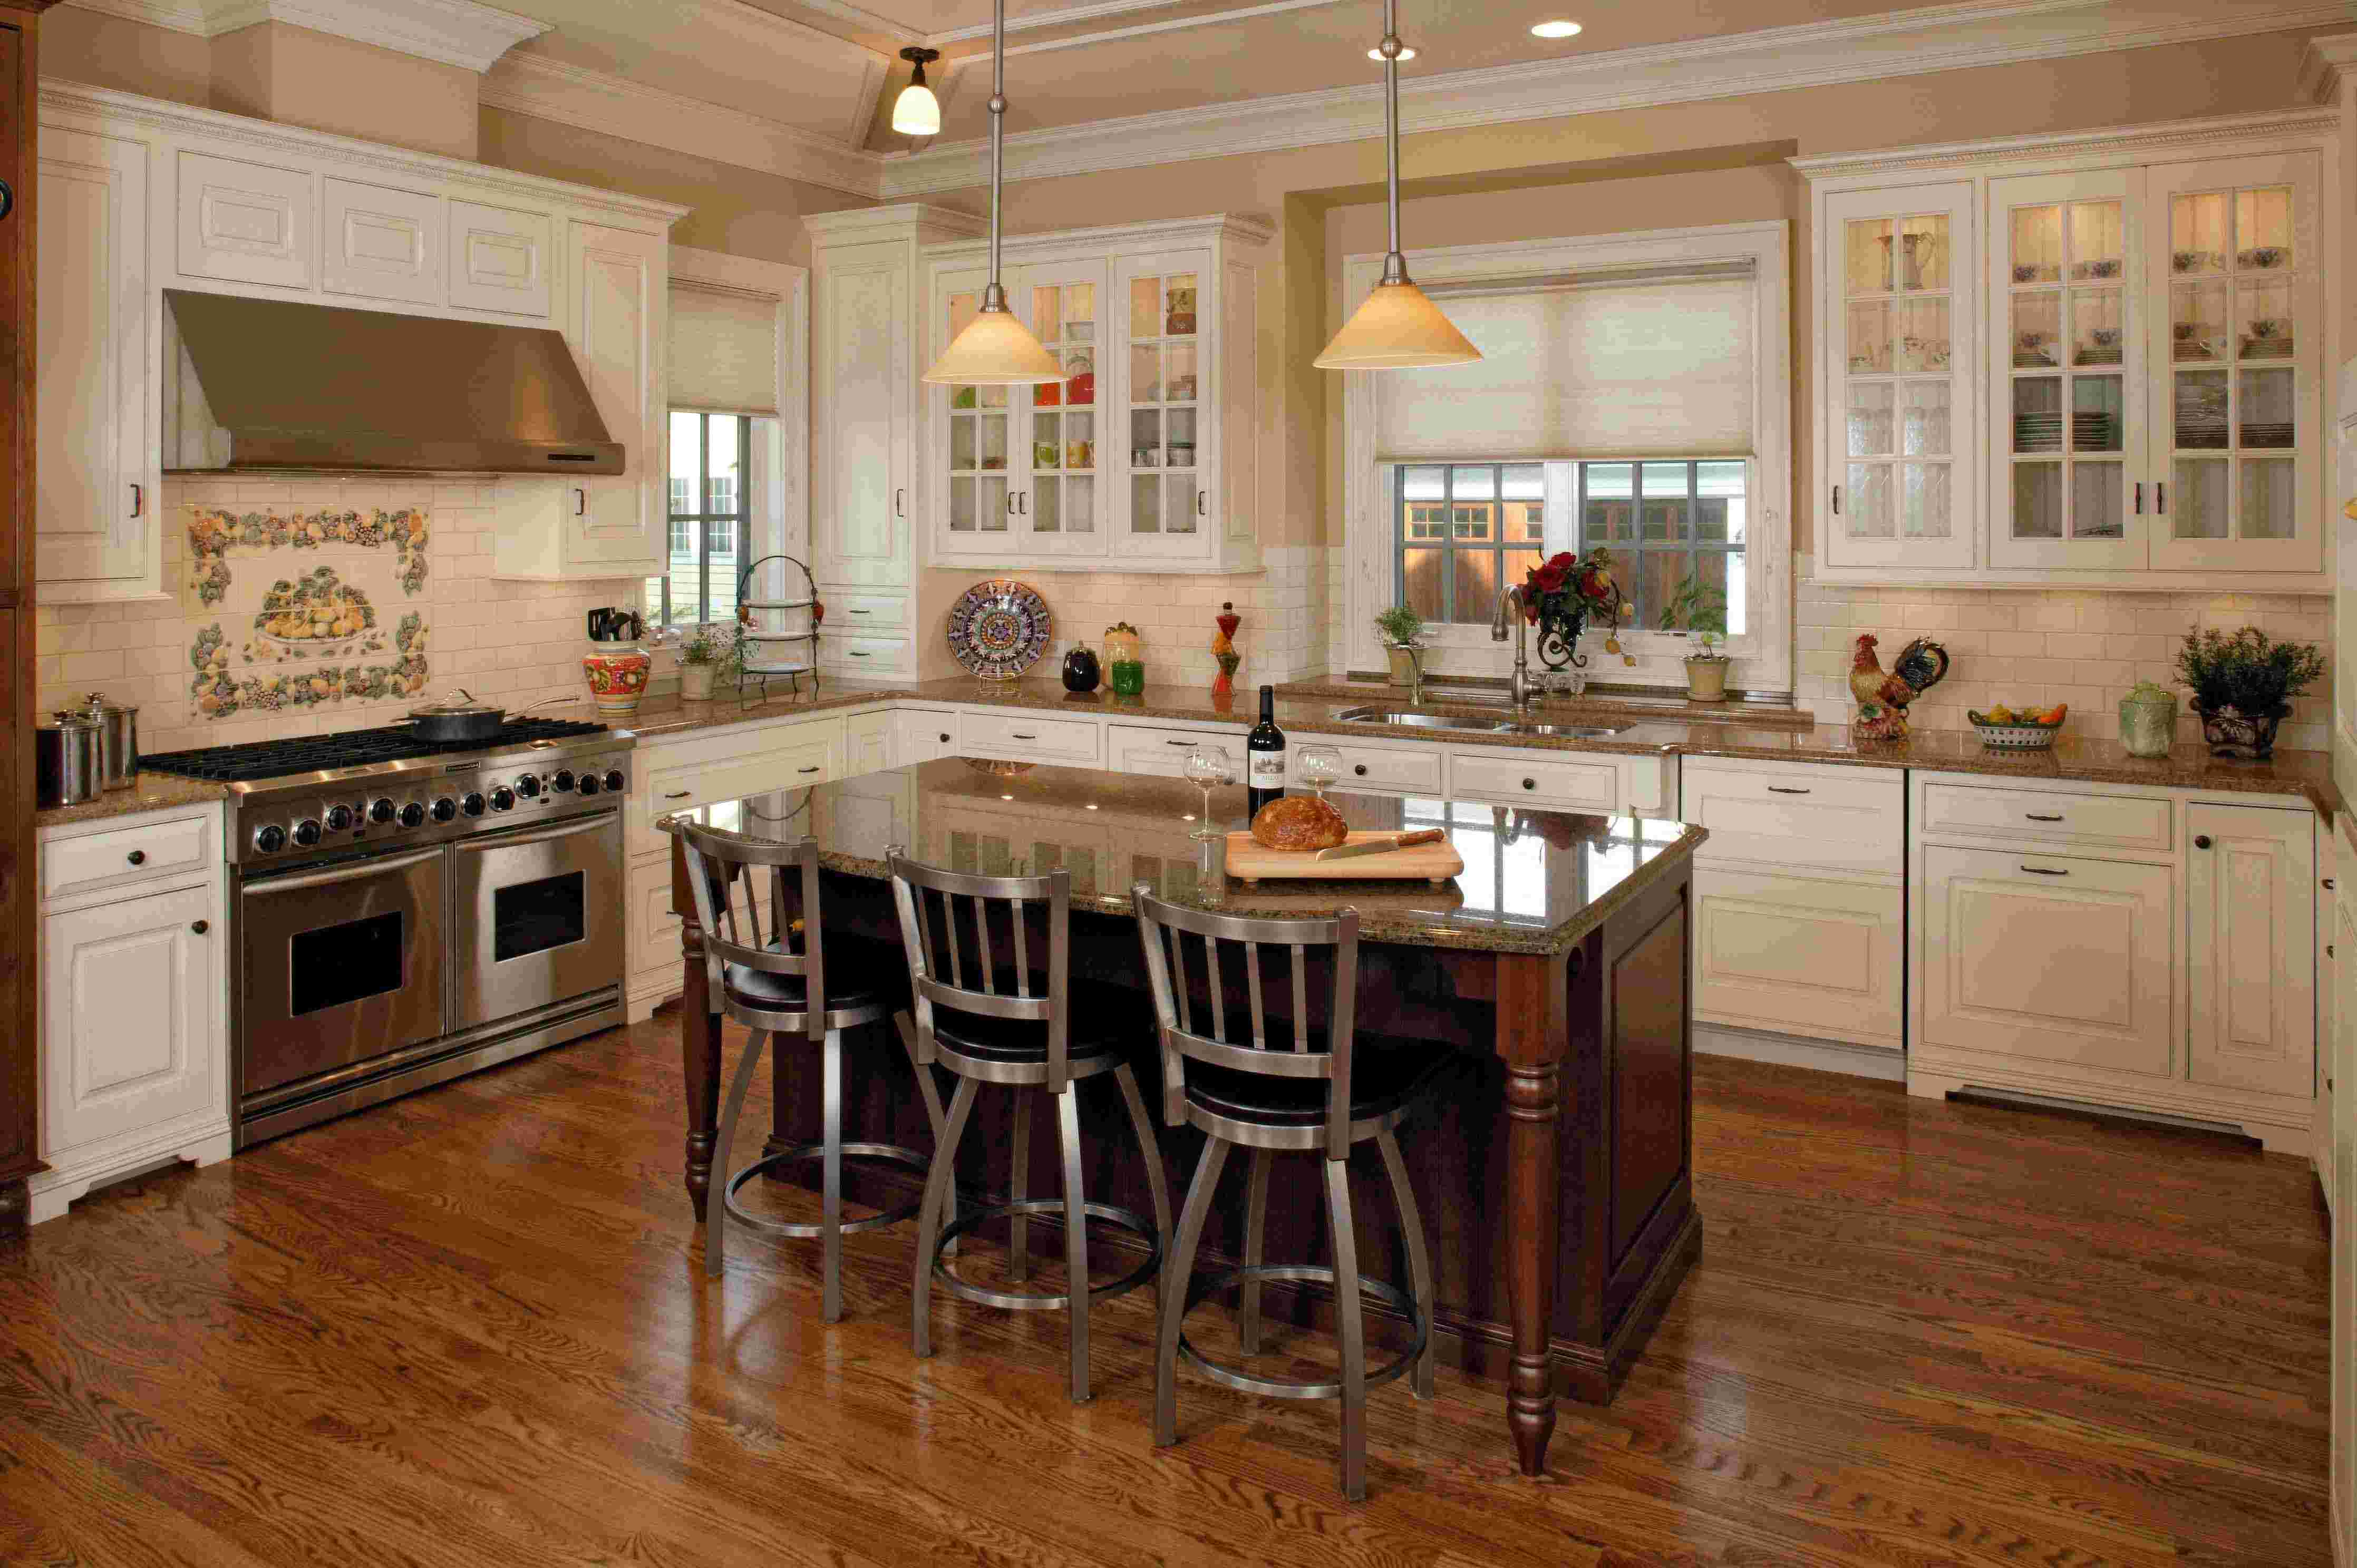 Corner kitchen island photo - 1